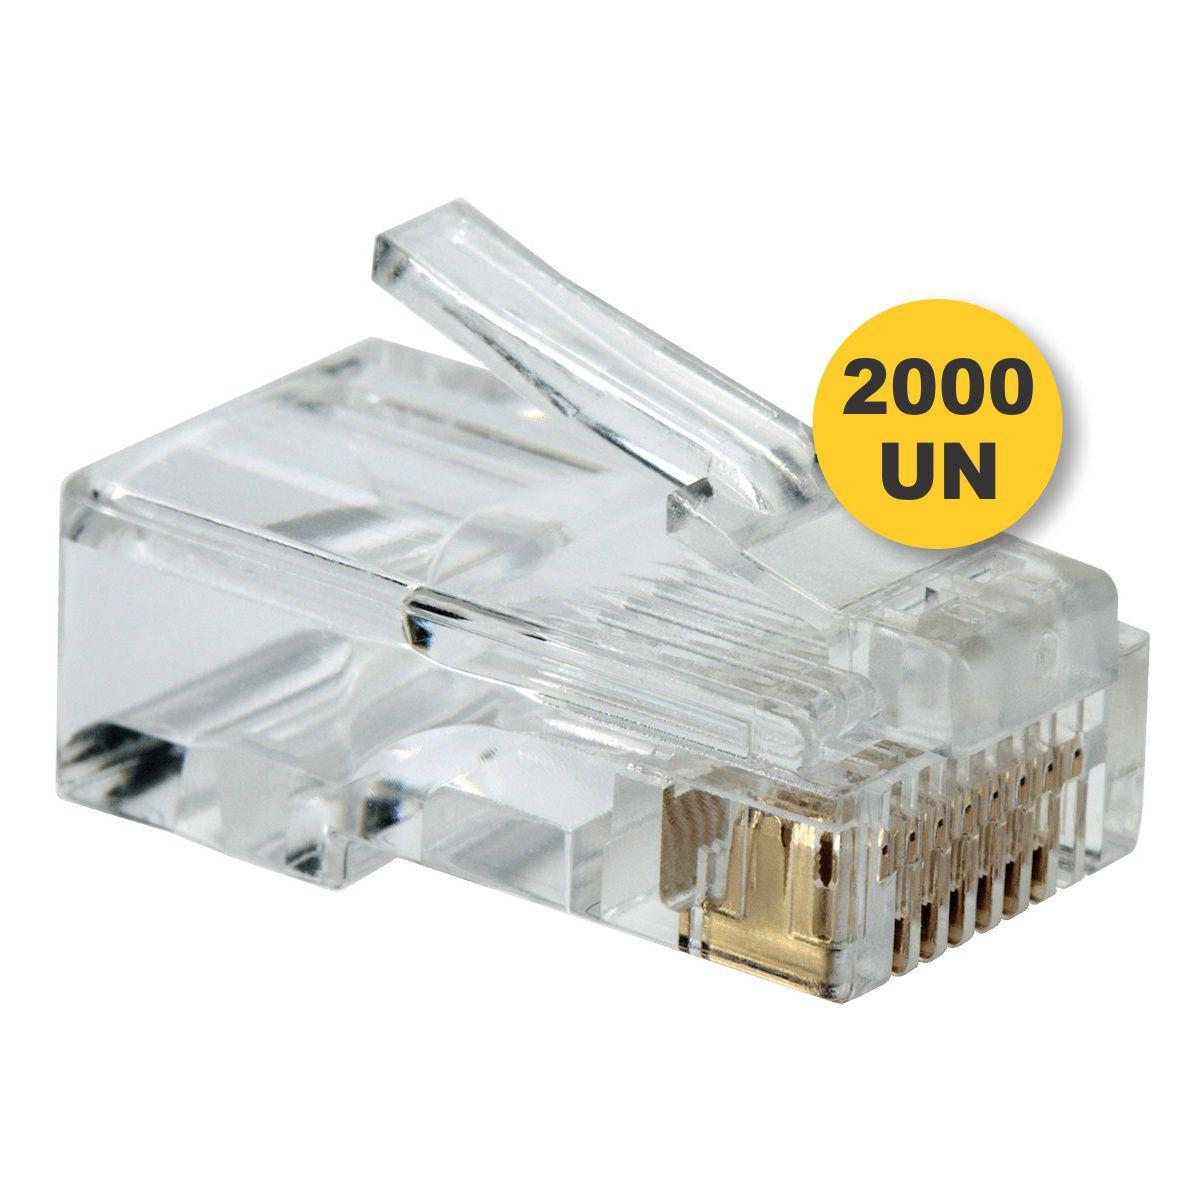 Pacote 2000 Unidades Conector Rj45 Cat5e Cabo Rede Lan Plug